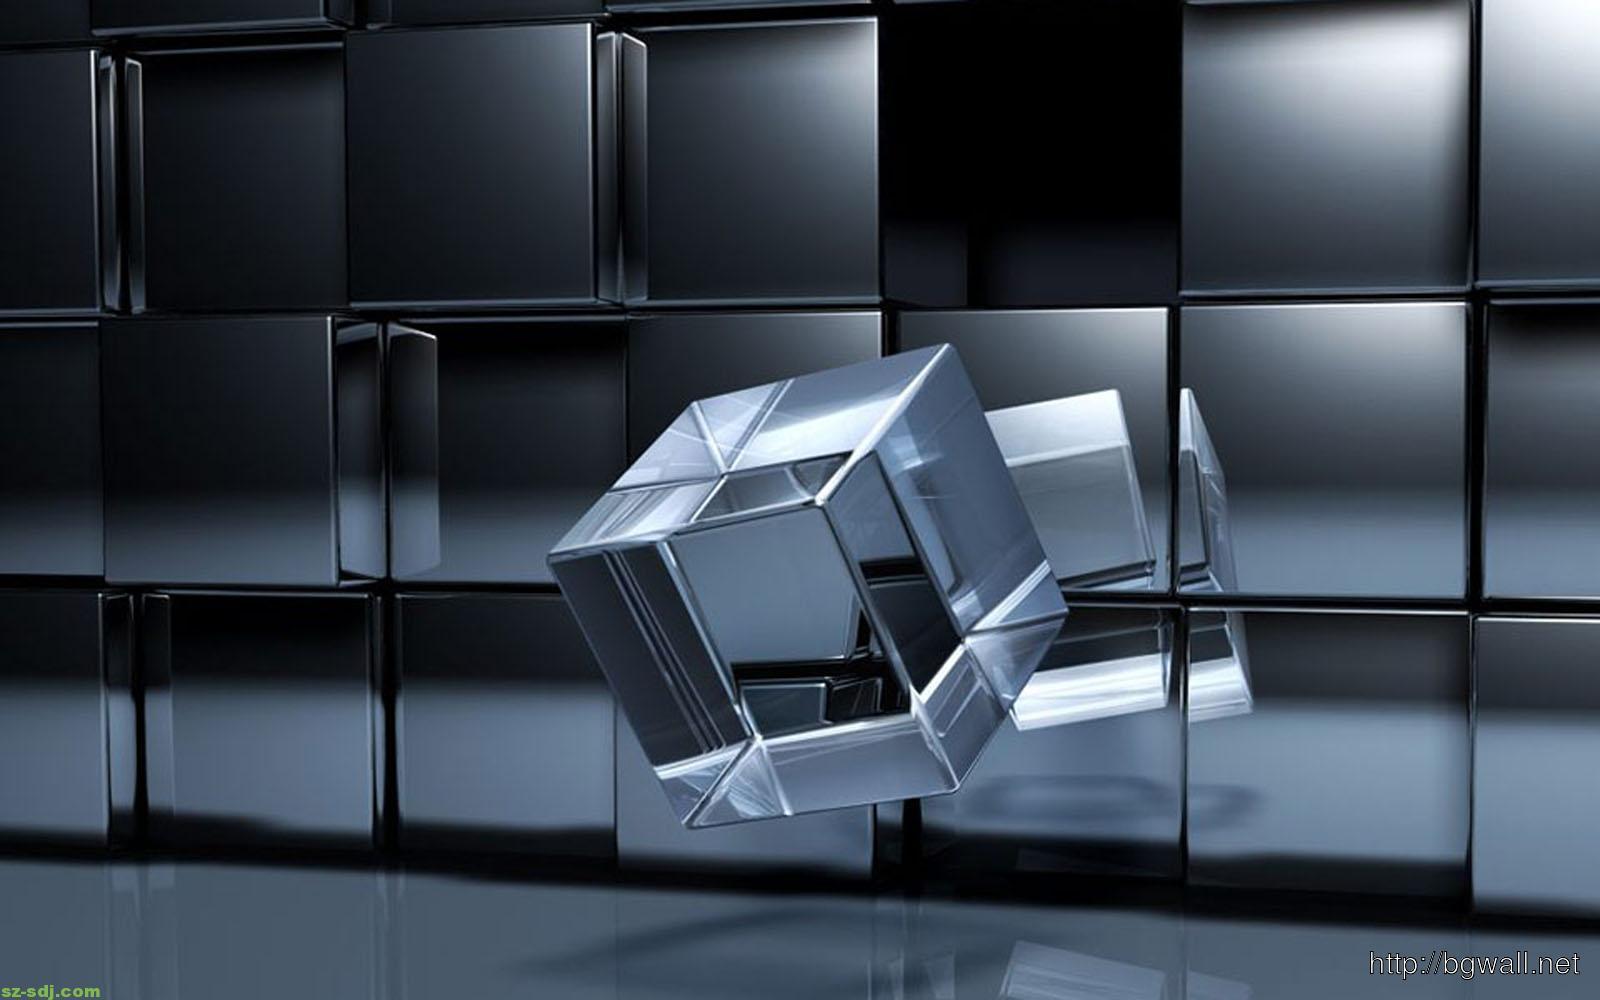 cysrtal-3d-cube-wallpaper-background